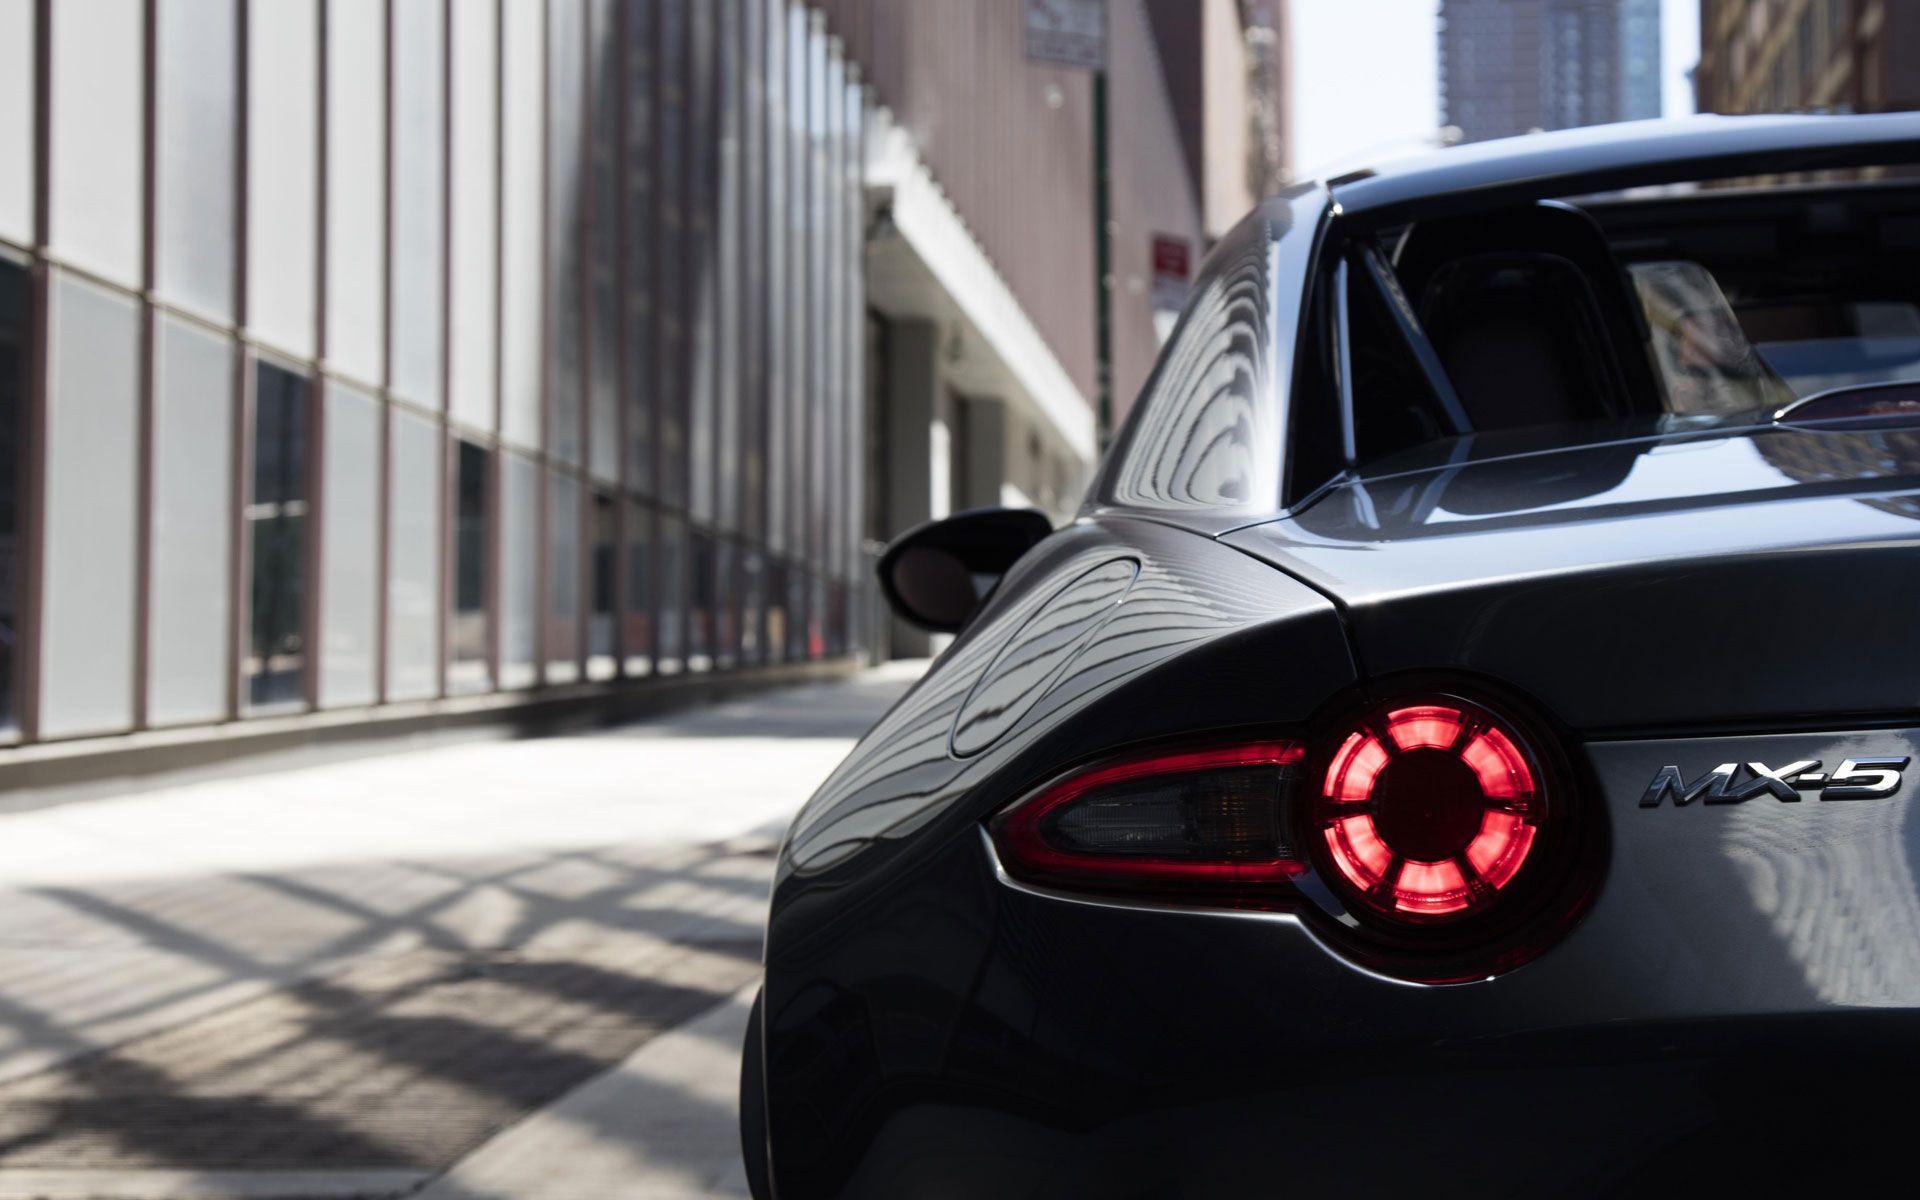 2017 Mazda MX5 Miata RF Design & Performance Features